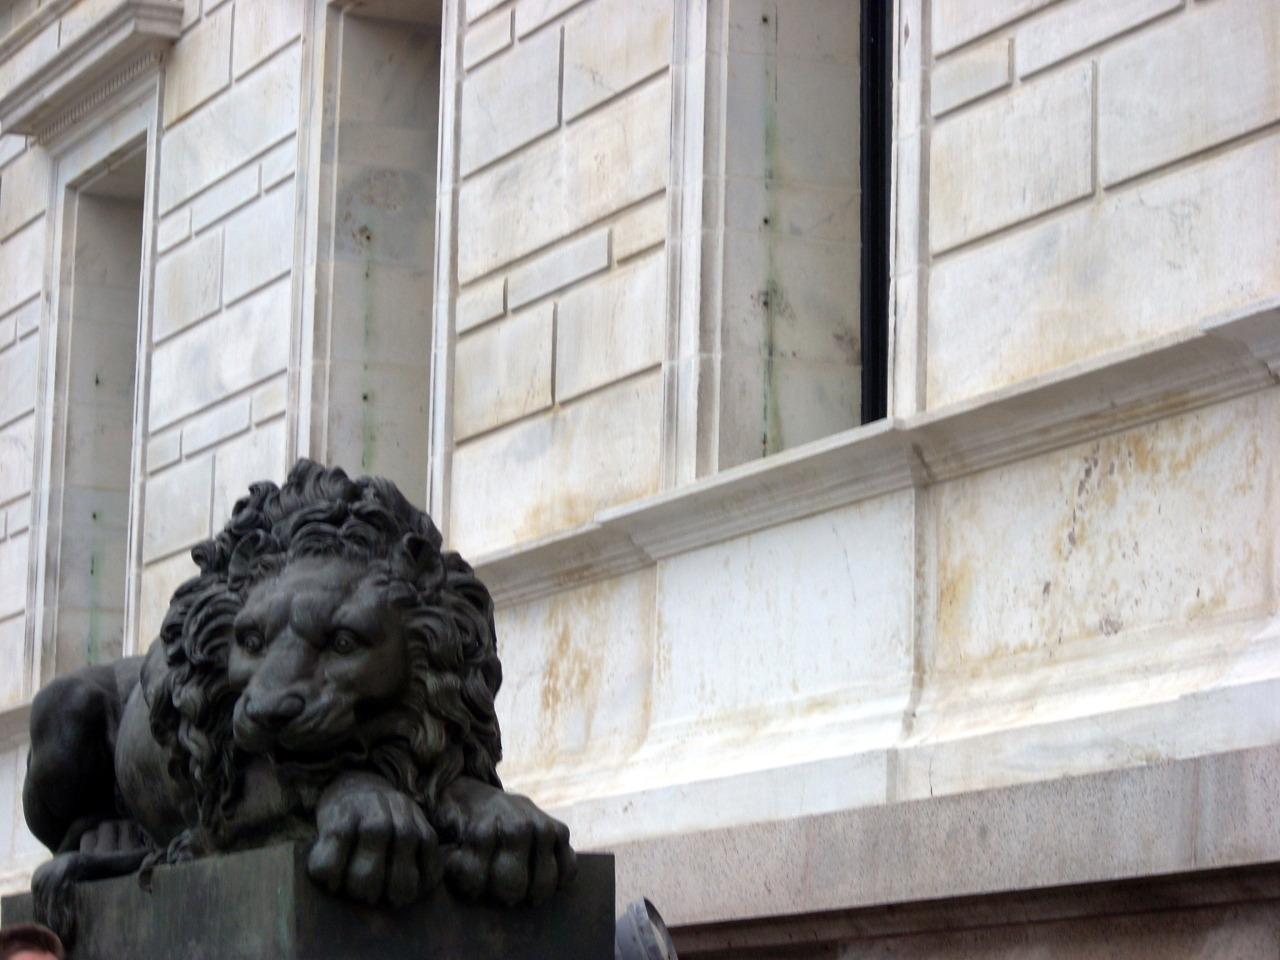 Lions -